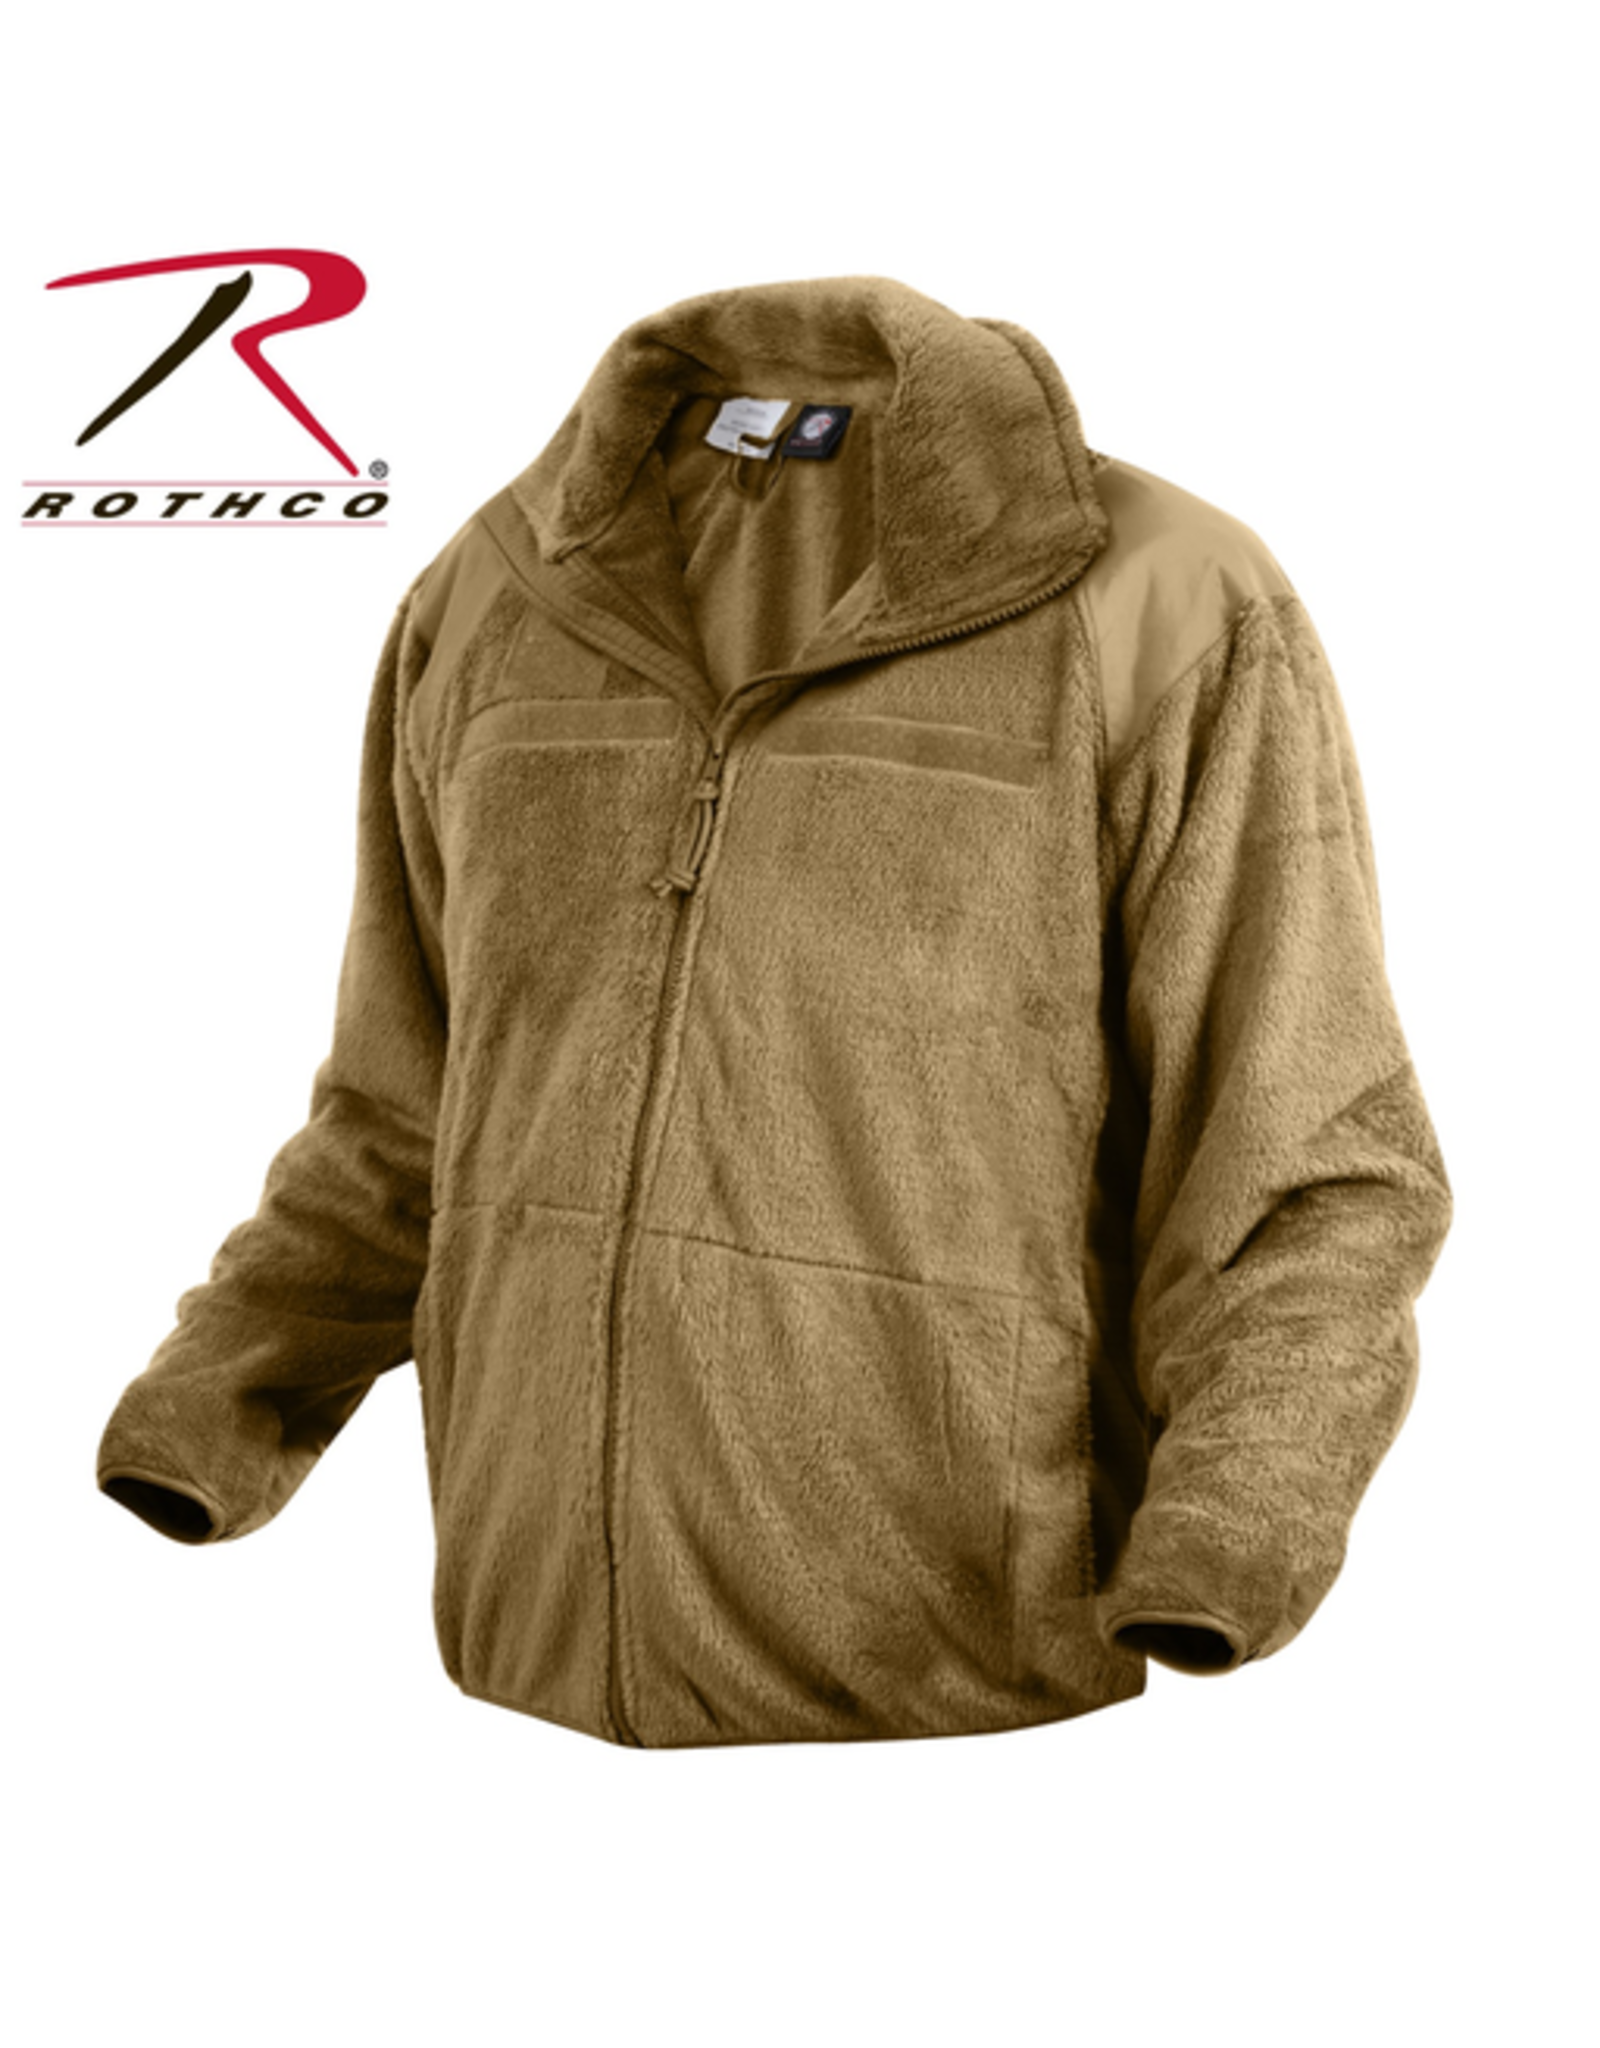 Rothco Rothco Generation III Level 3 ECWCS Fleece Jacket - P-20282